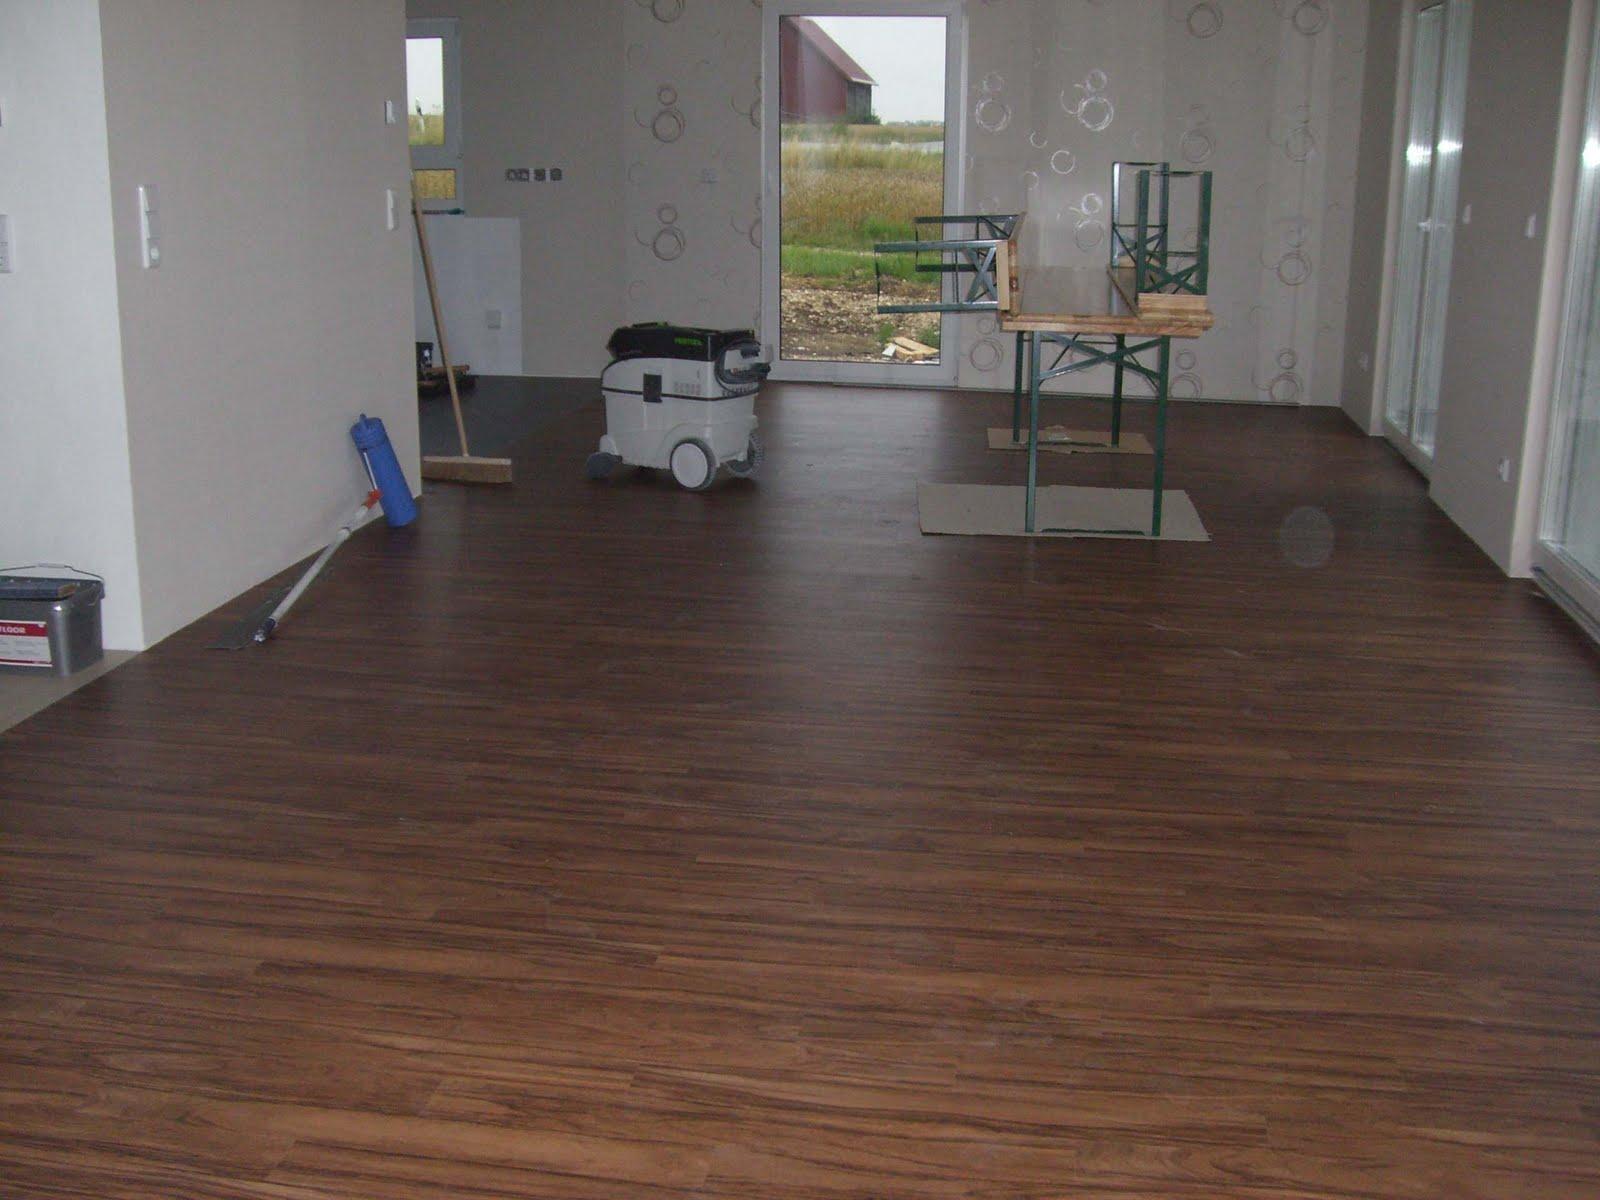 christian susi bauen ein haus mit danwood. Black Bedroom Furniture Sets. Home Design Ideas